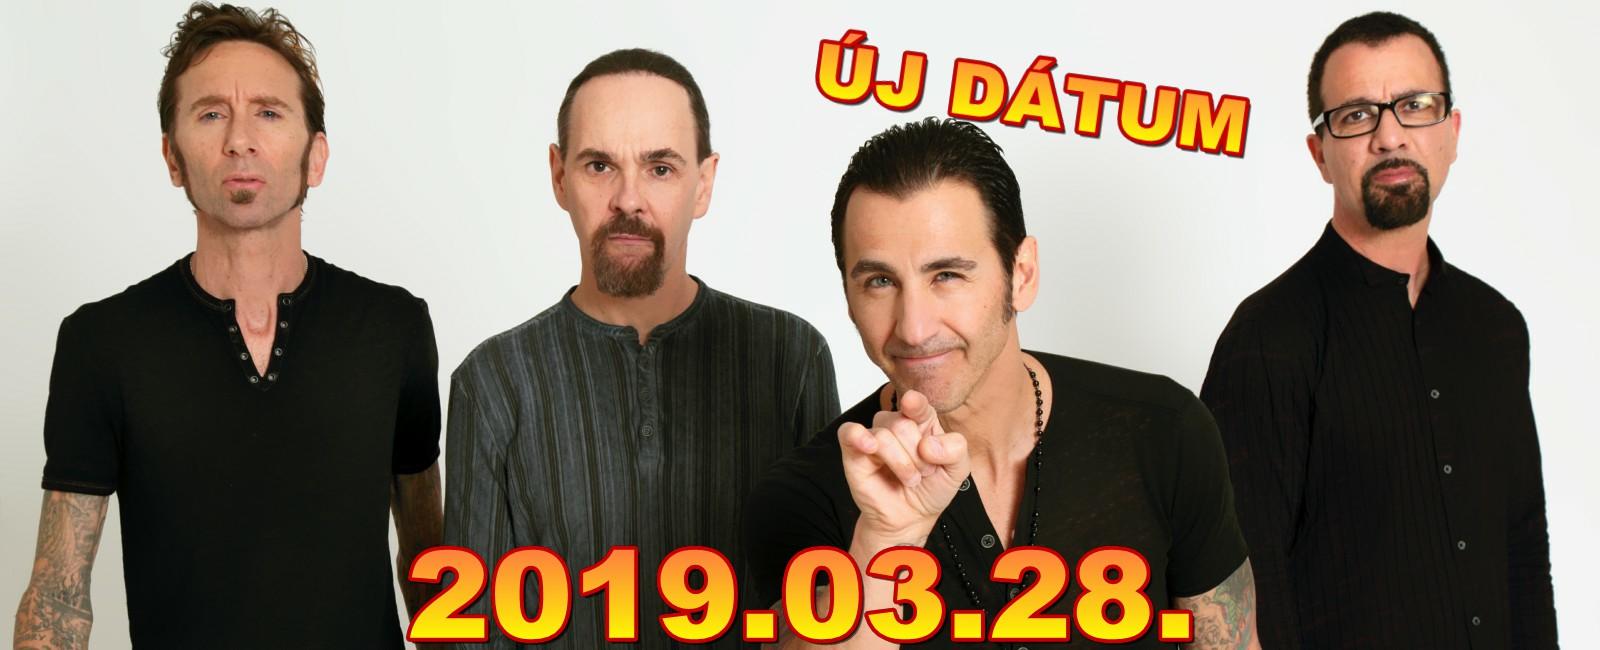 04637 (8X10 and Promo)cropúj dátum